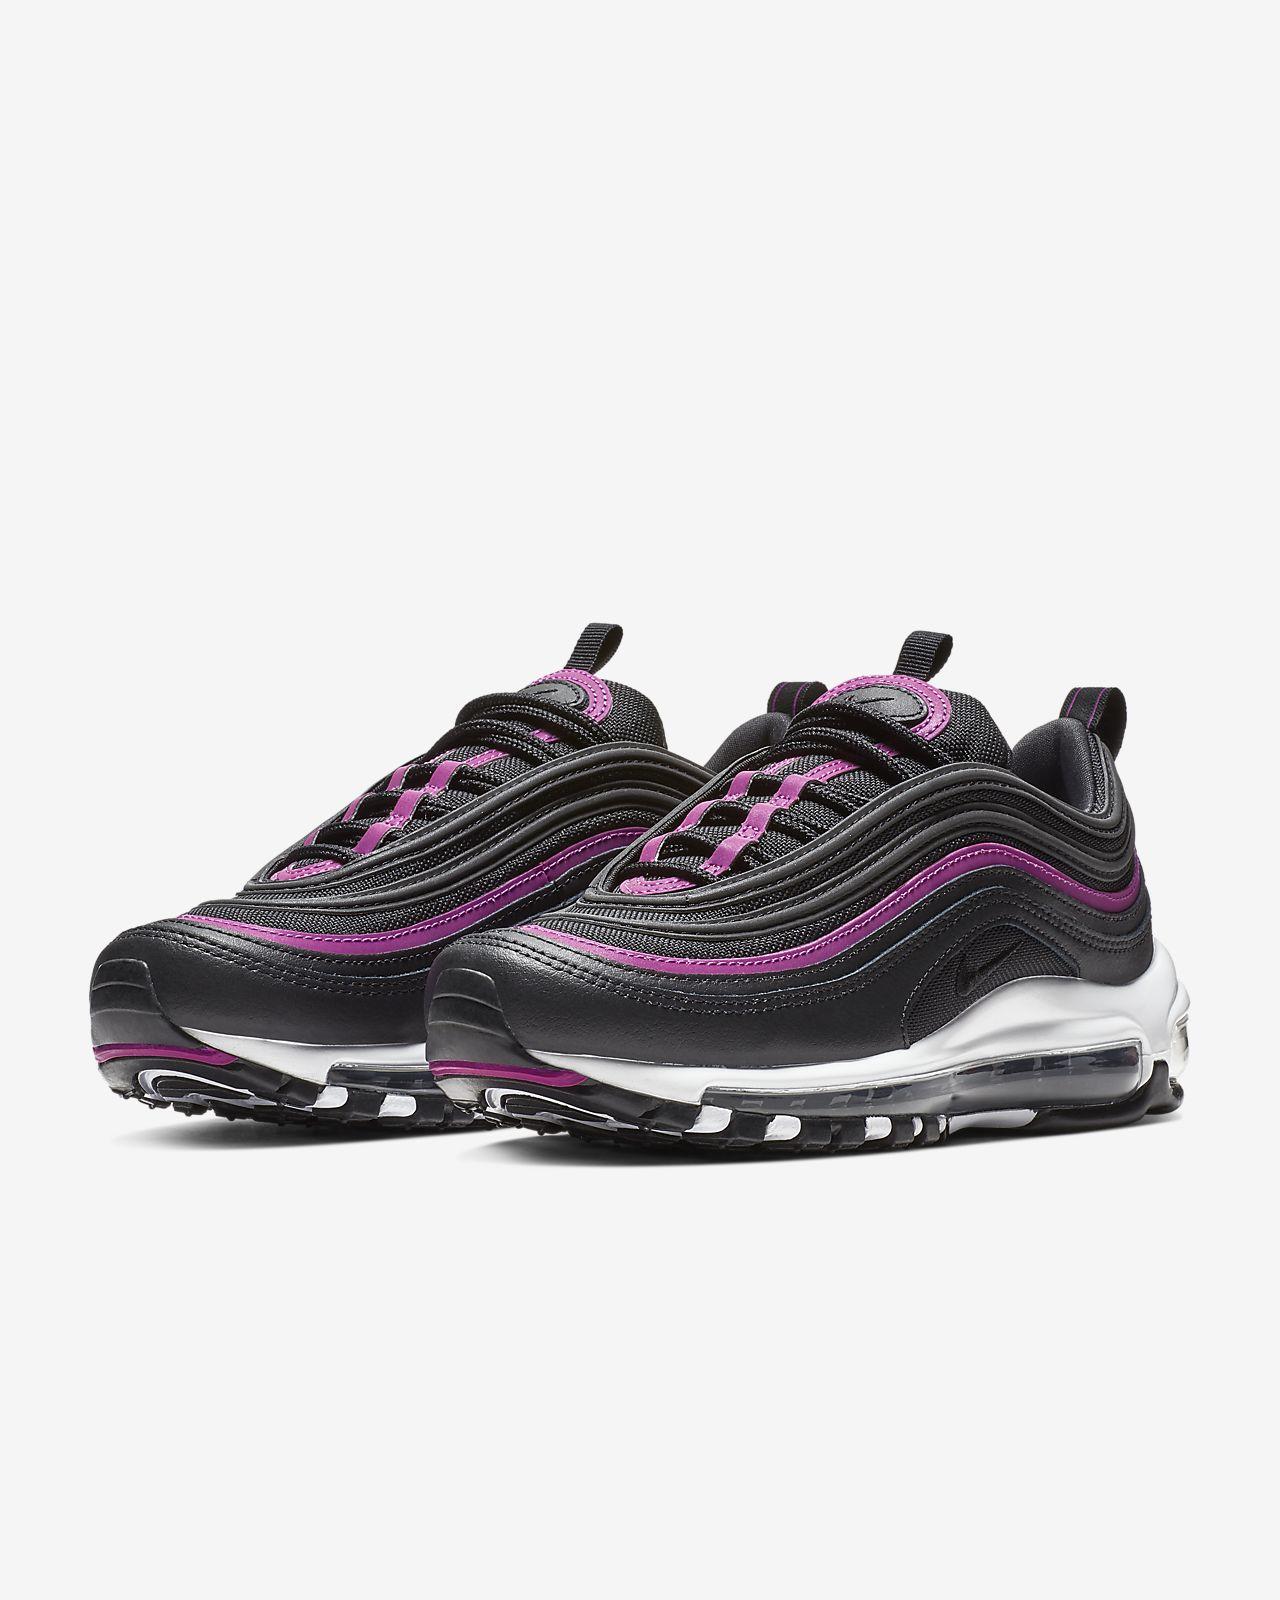 458c1c31476b4f Nike Air Max 97 LX Women s Shoe. Nike.com RO